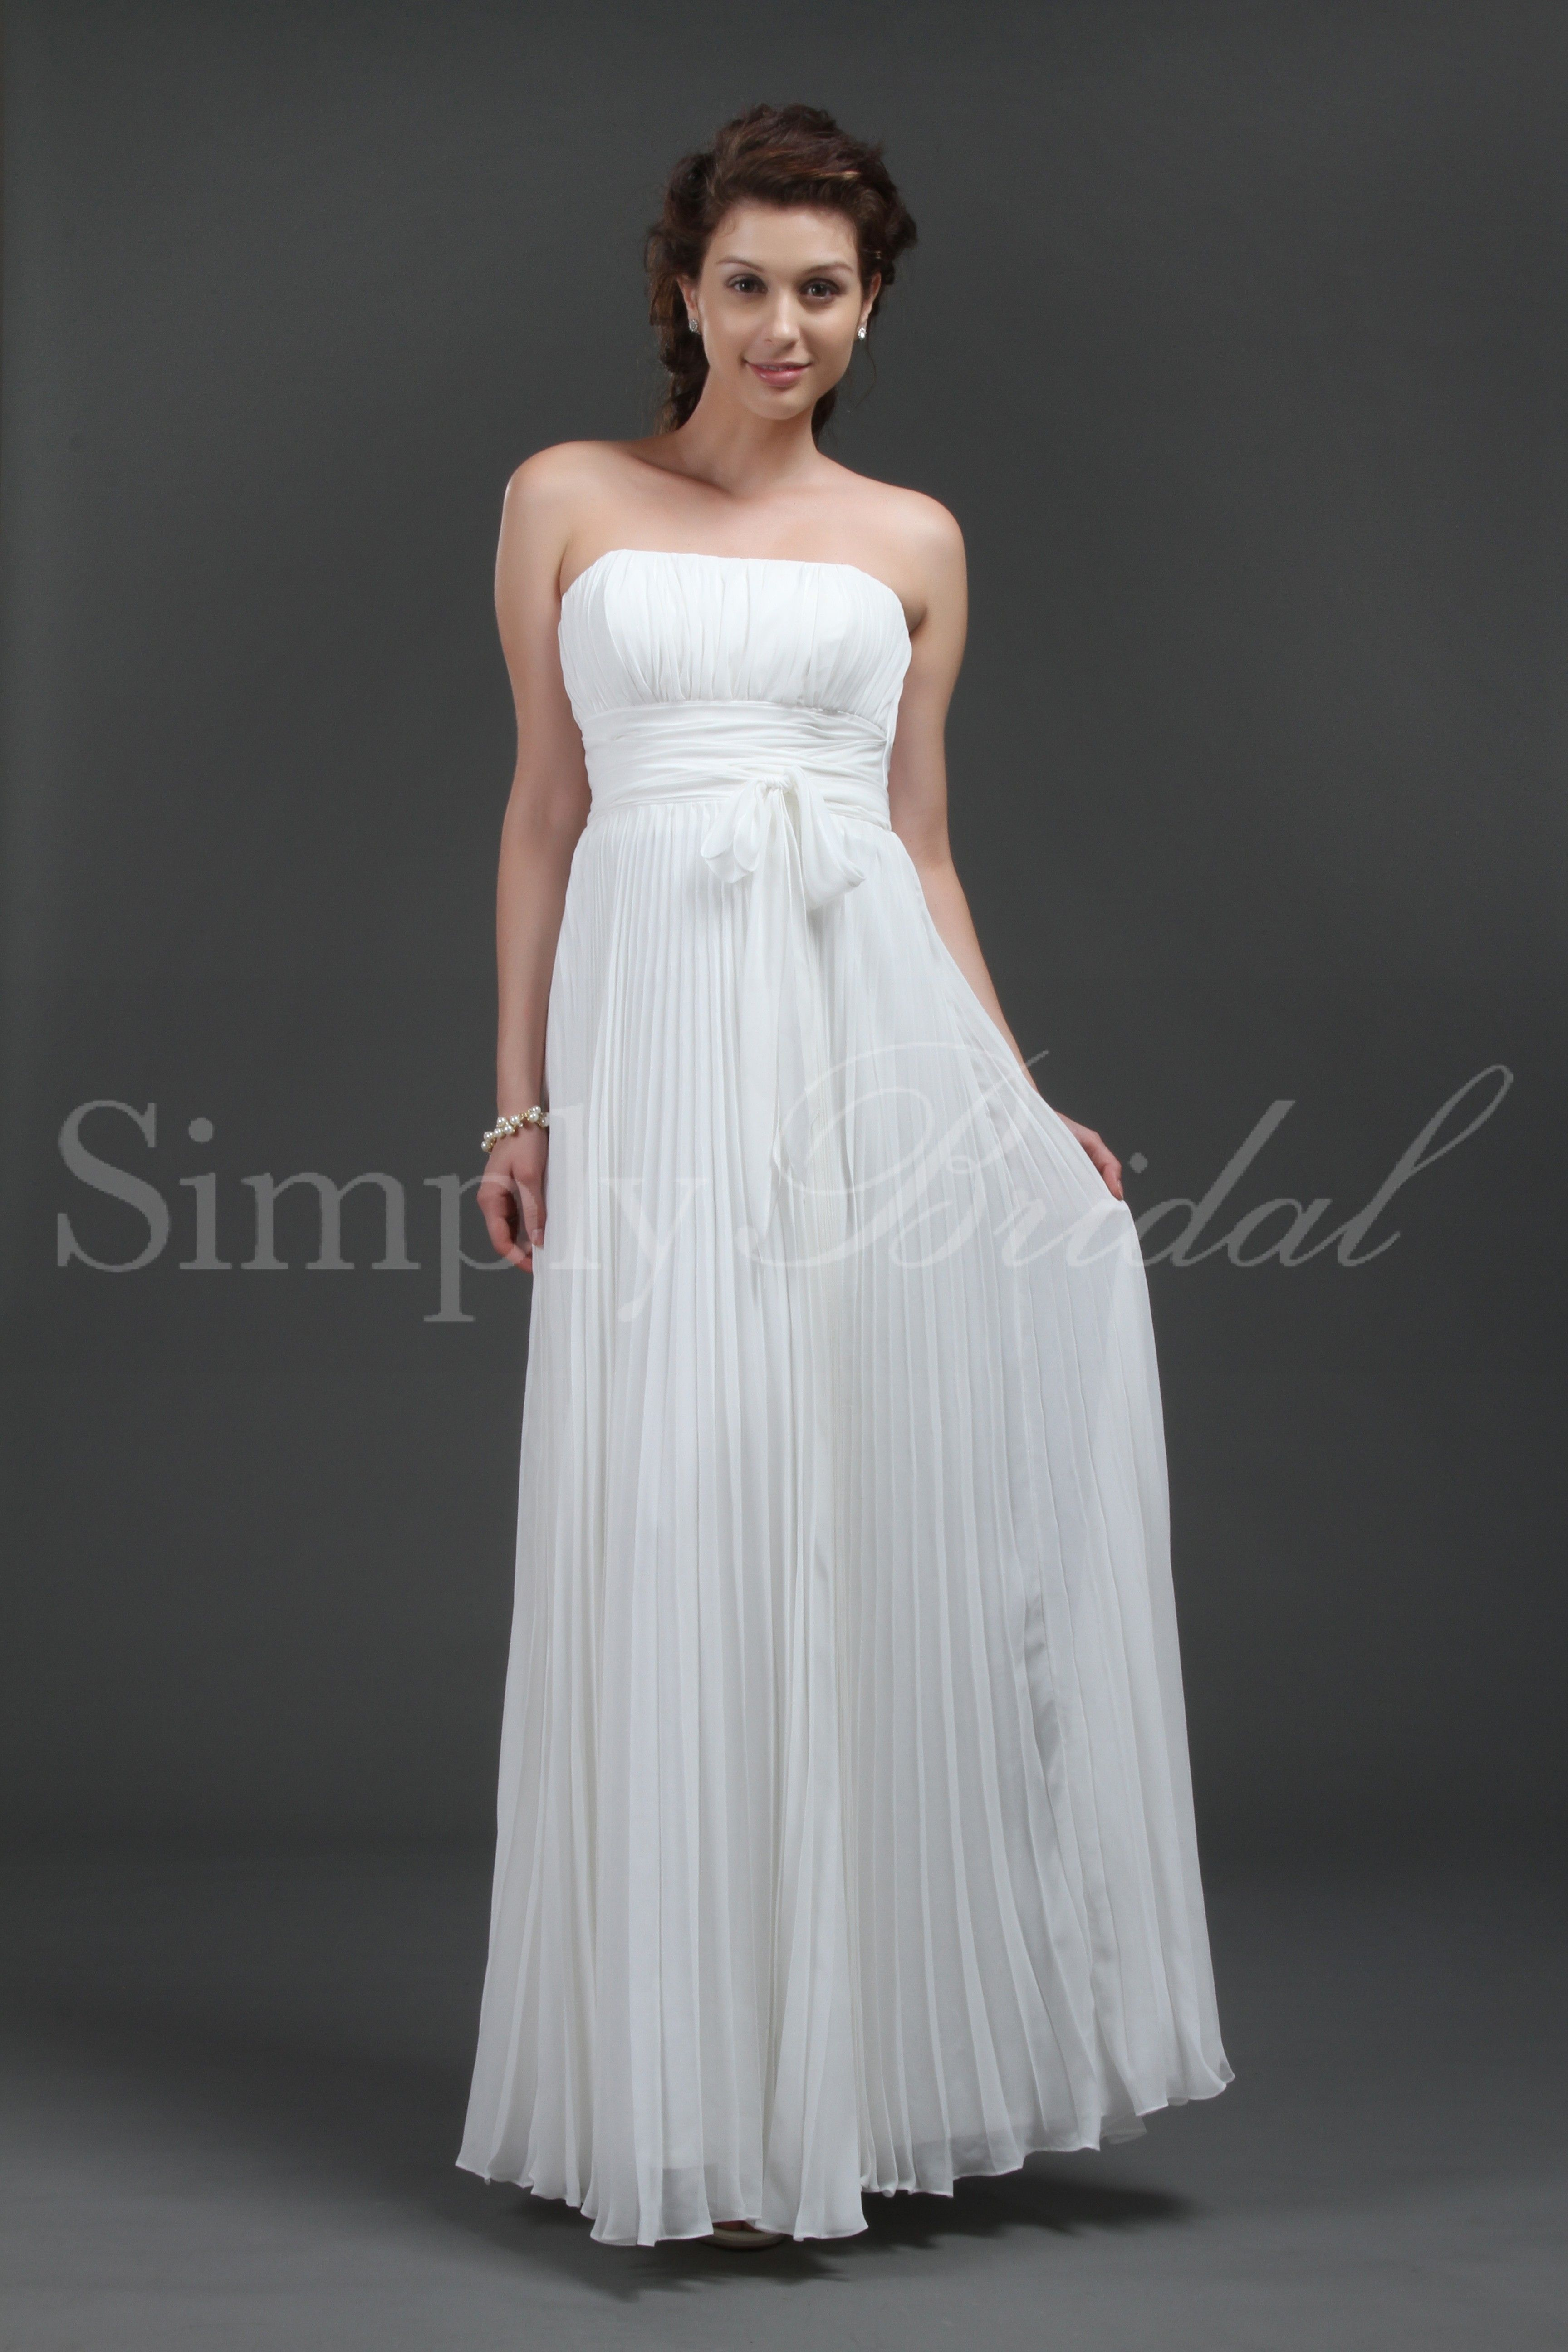 Wedding renewal dresses for beach  Eloise Gown  Weddings Simple weddings and Wedding